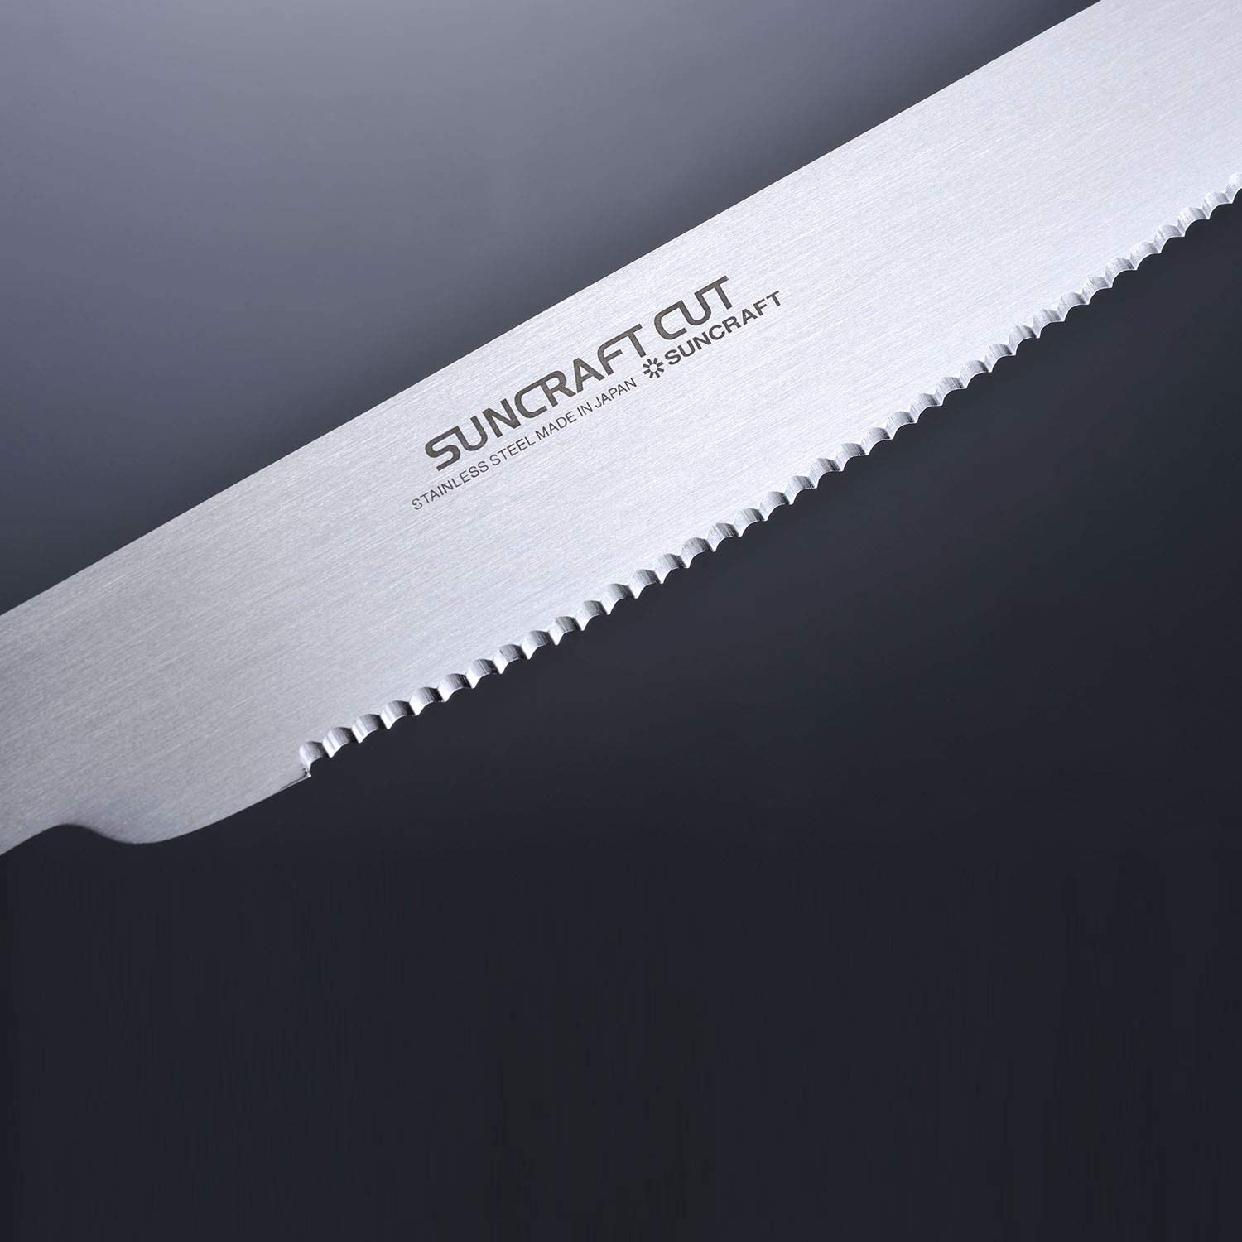 SUNCRAFT(サンクラフト) スムーズパン切りナイフ HE-2101の商品画像10